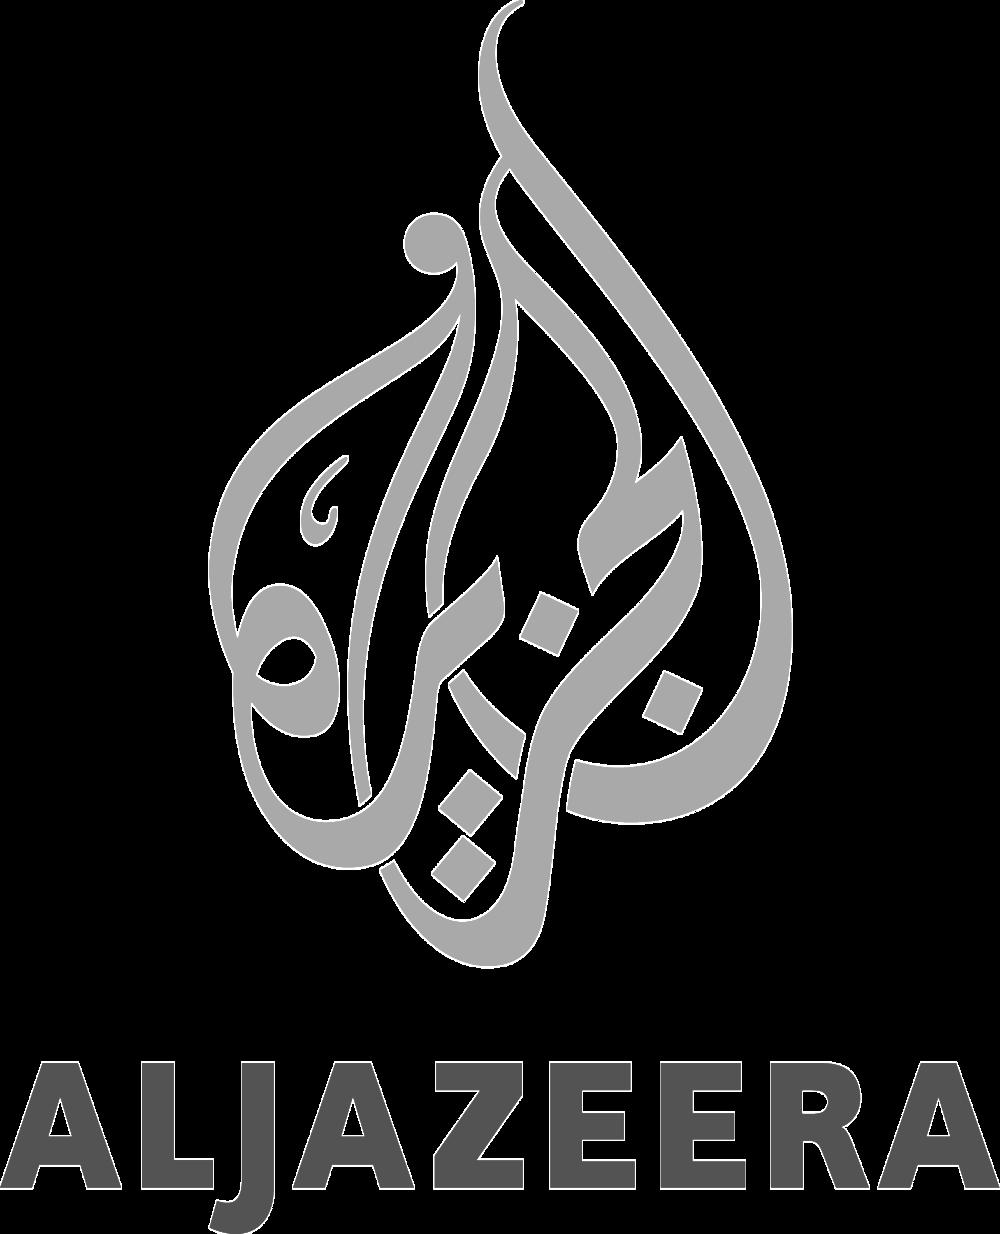 al-jazeera-logo.png